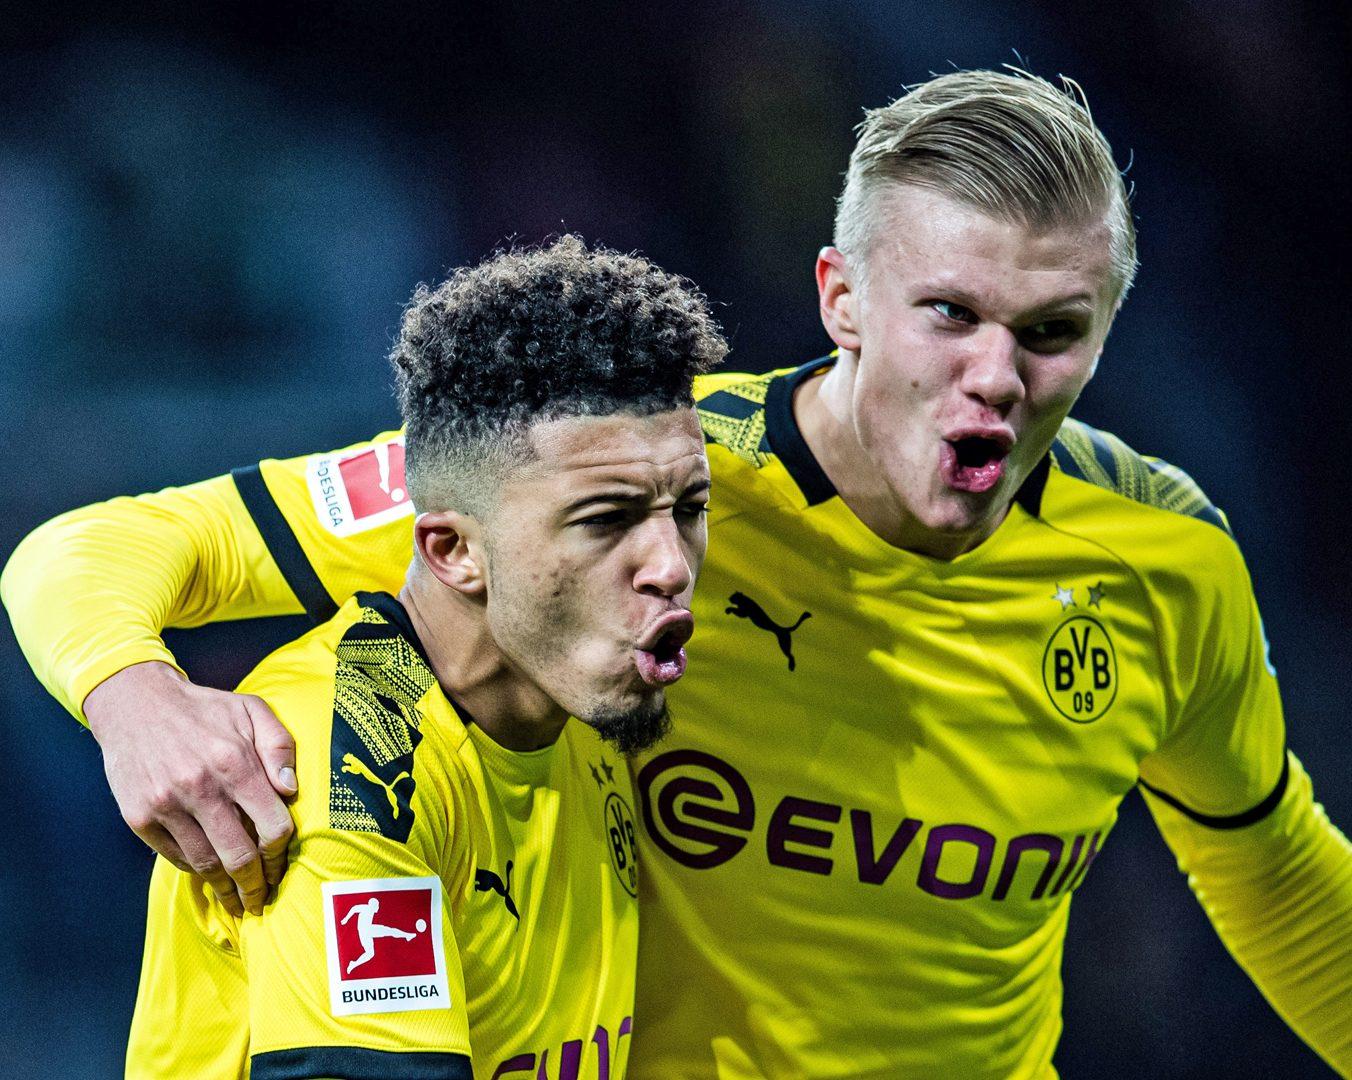 Bundesliga Erling Haaland I Clicked With Jadon Sancho Marco Reus And Thorgan Hazard Straight Away